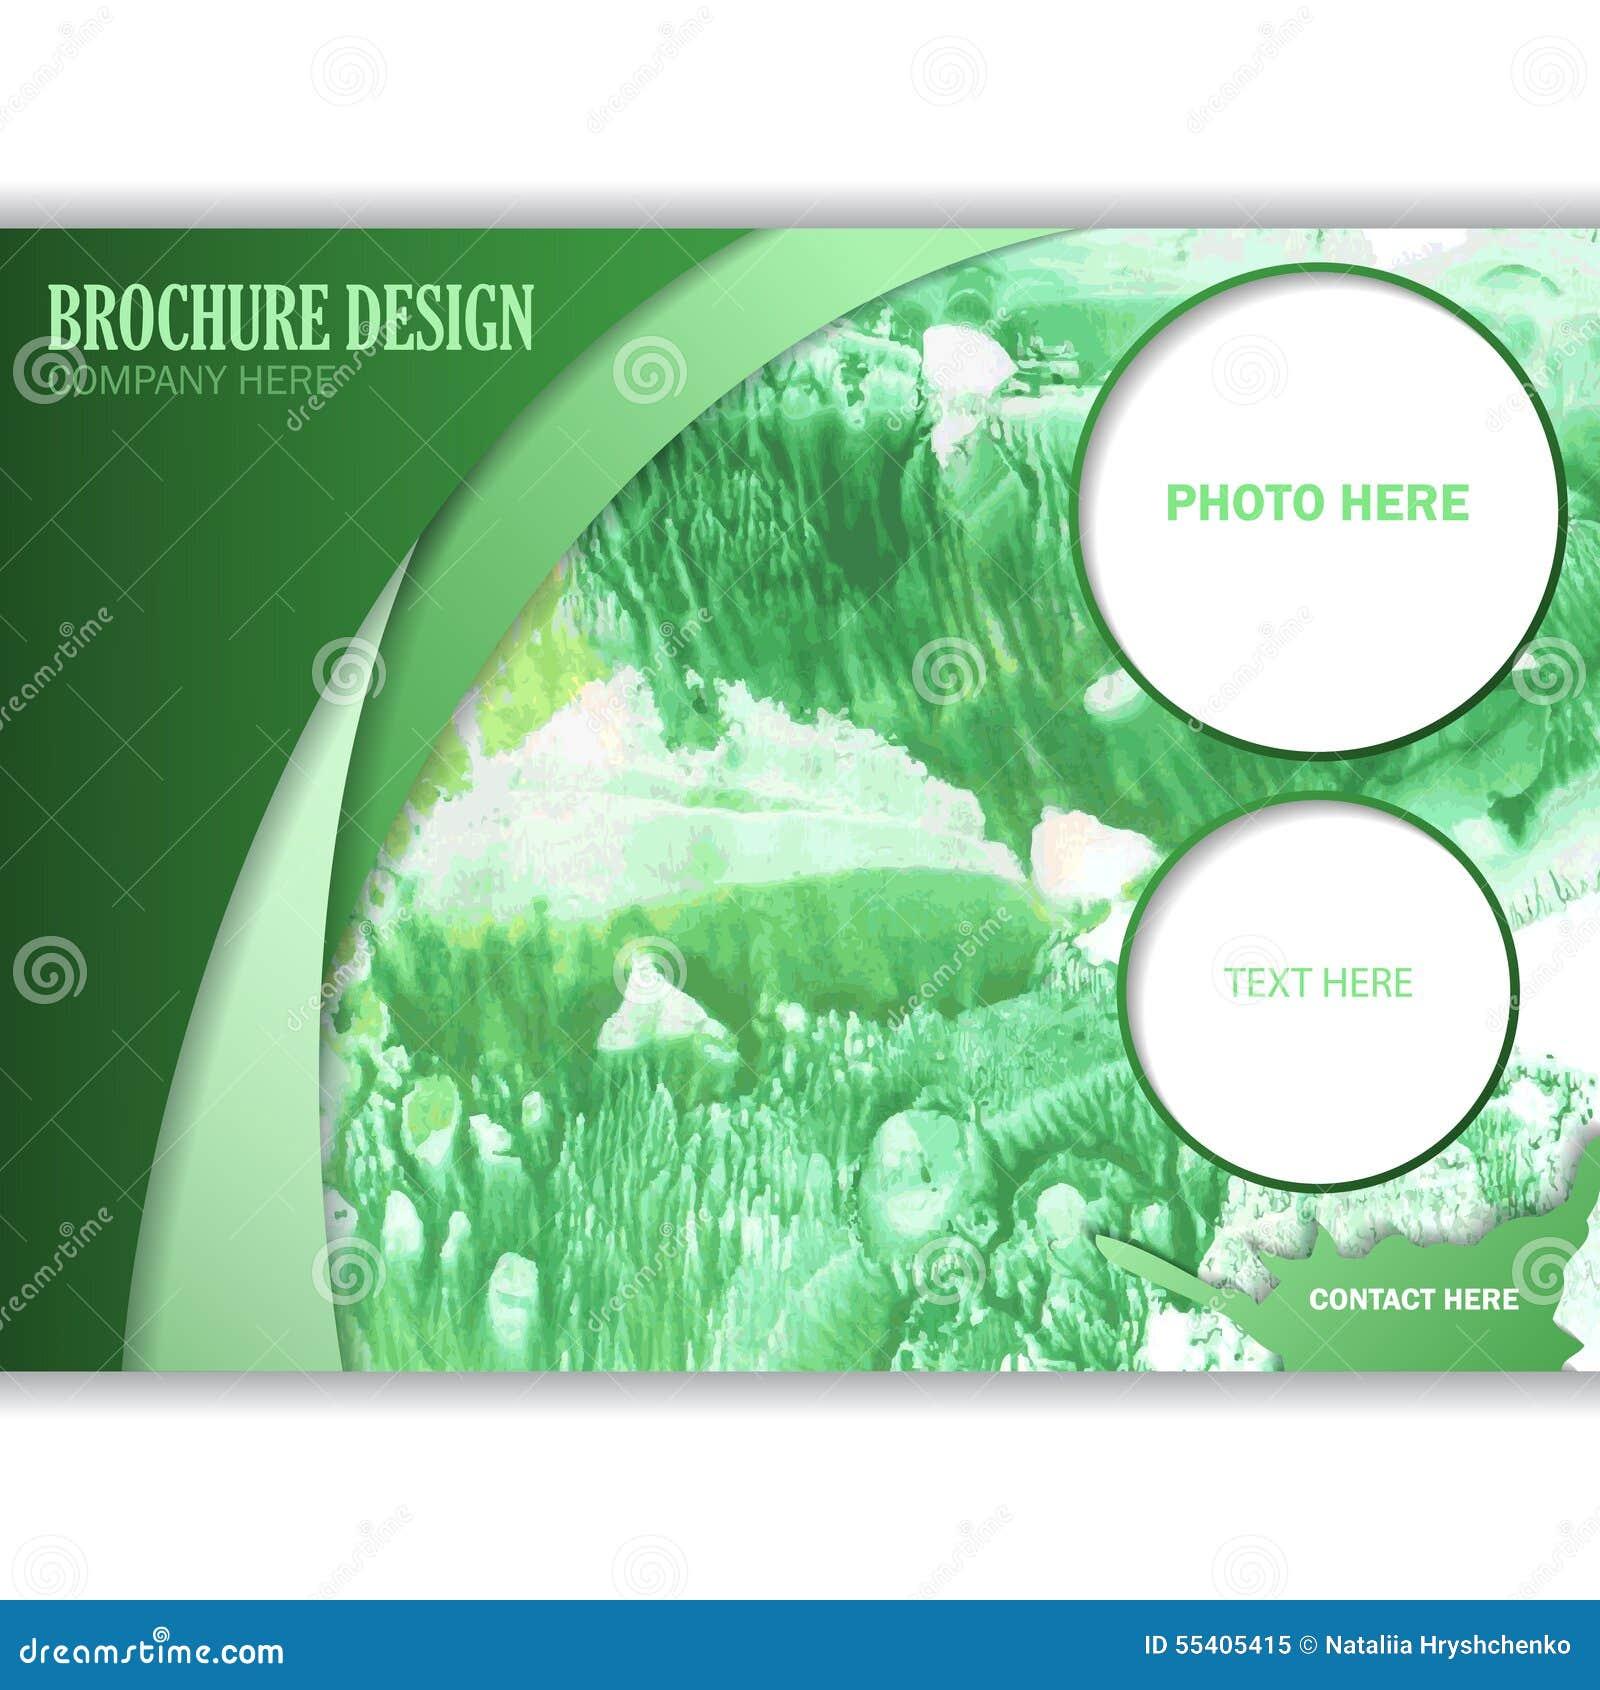 Horizontal business brochure for design stock vector for Horizontal brochure design